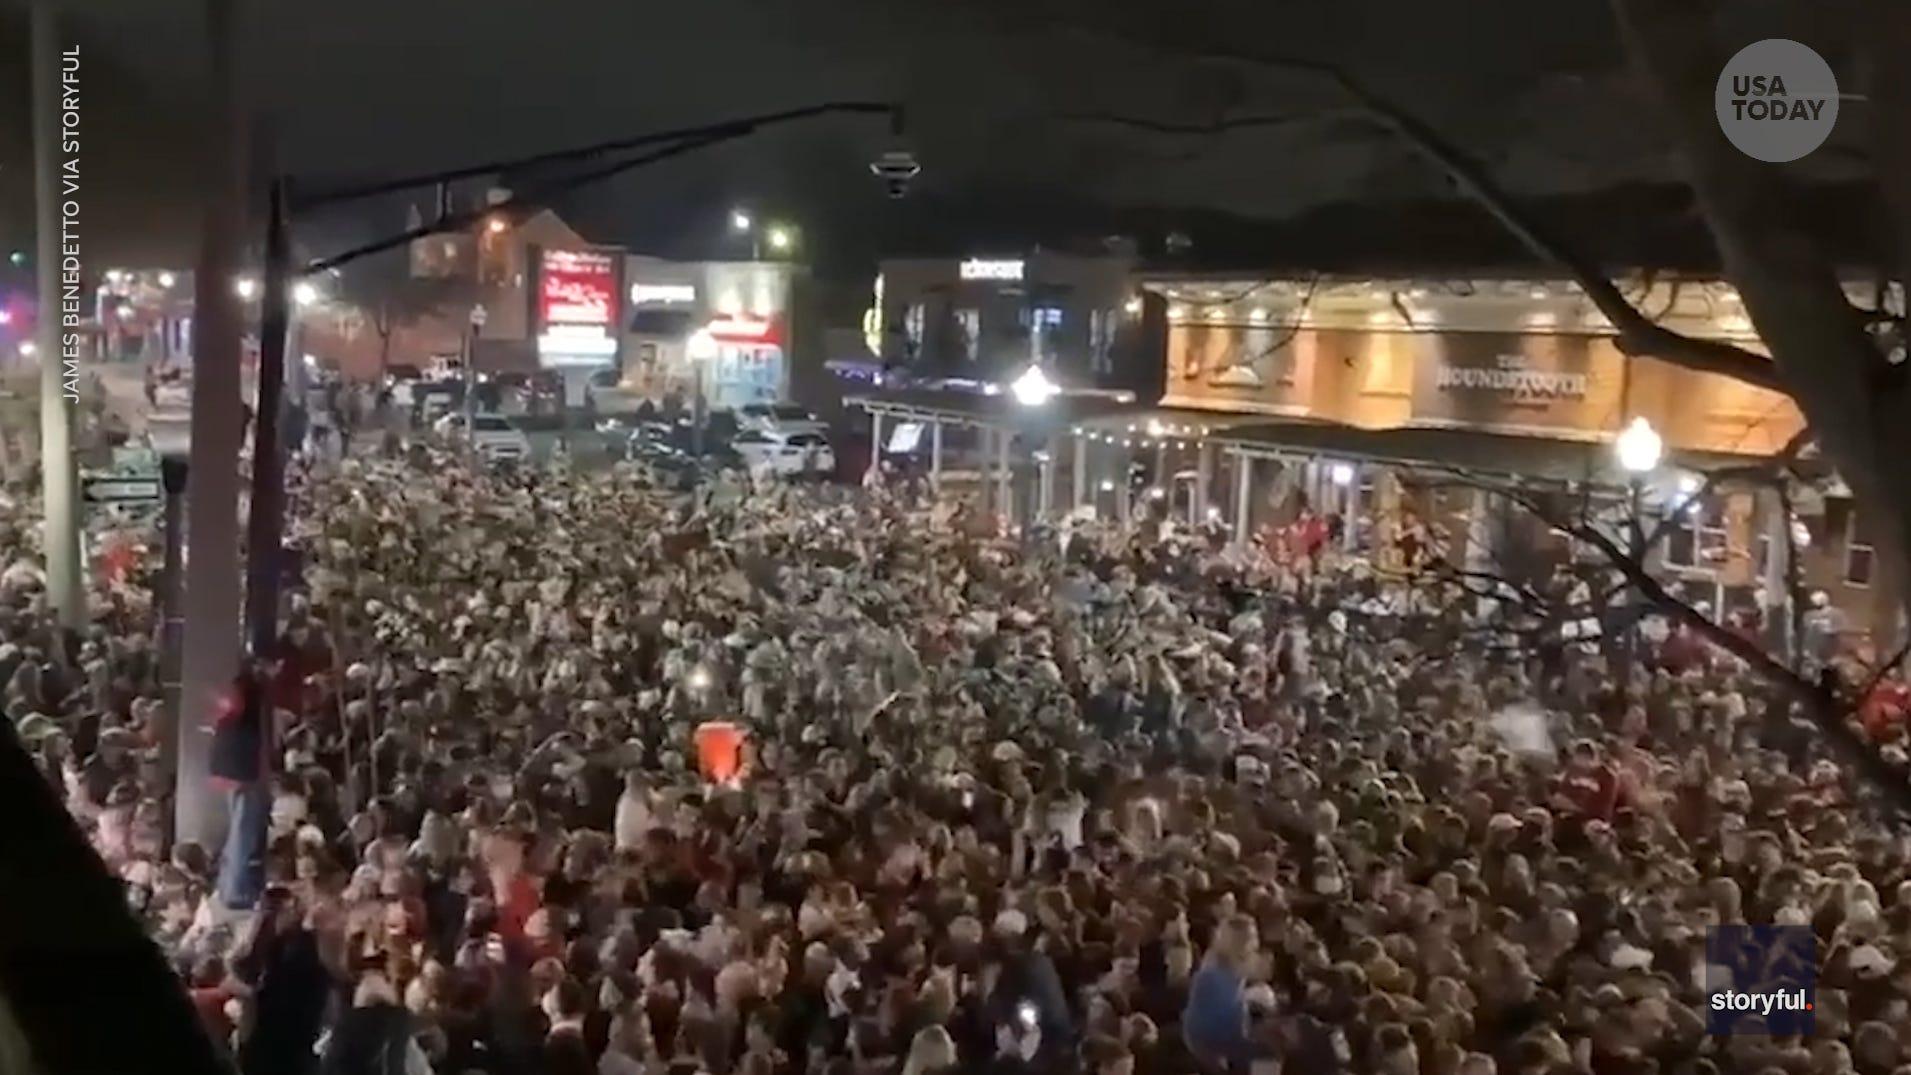 Alabama fans spill into Strip in Tuscaloosa celebrating